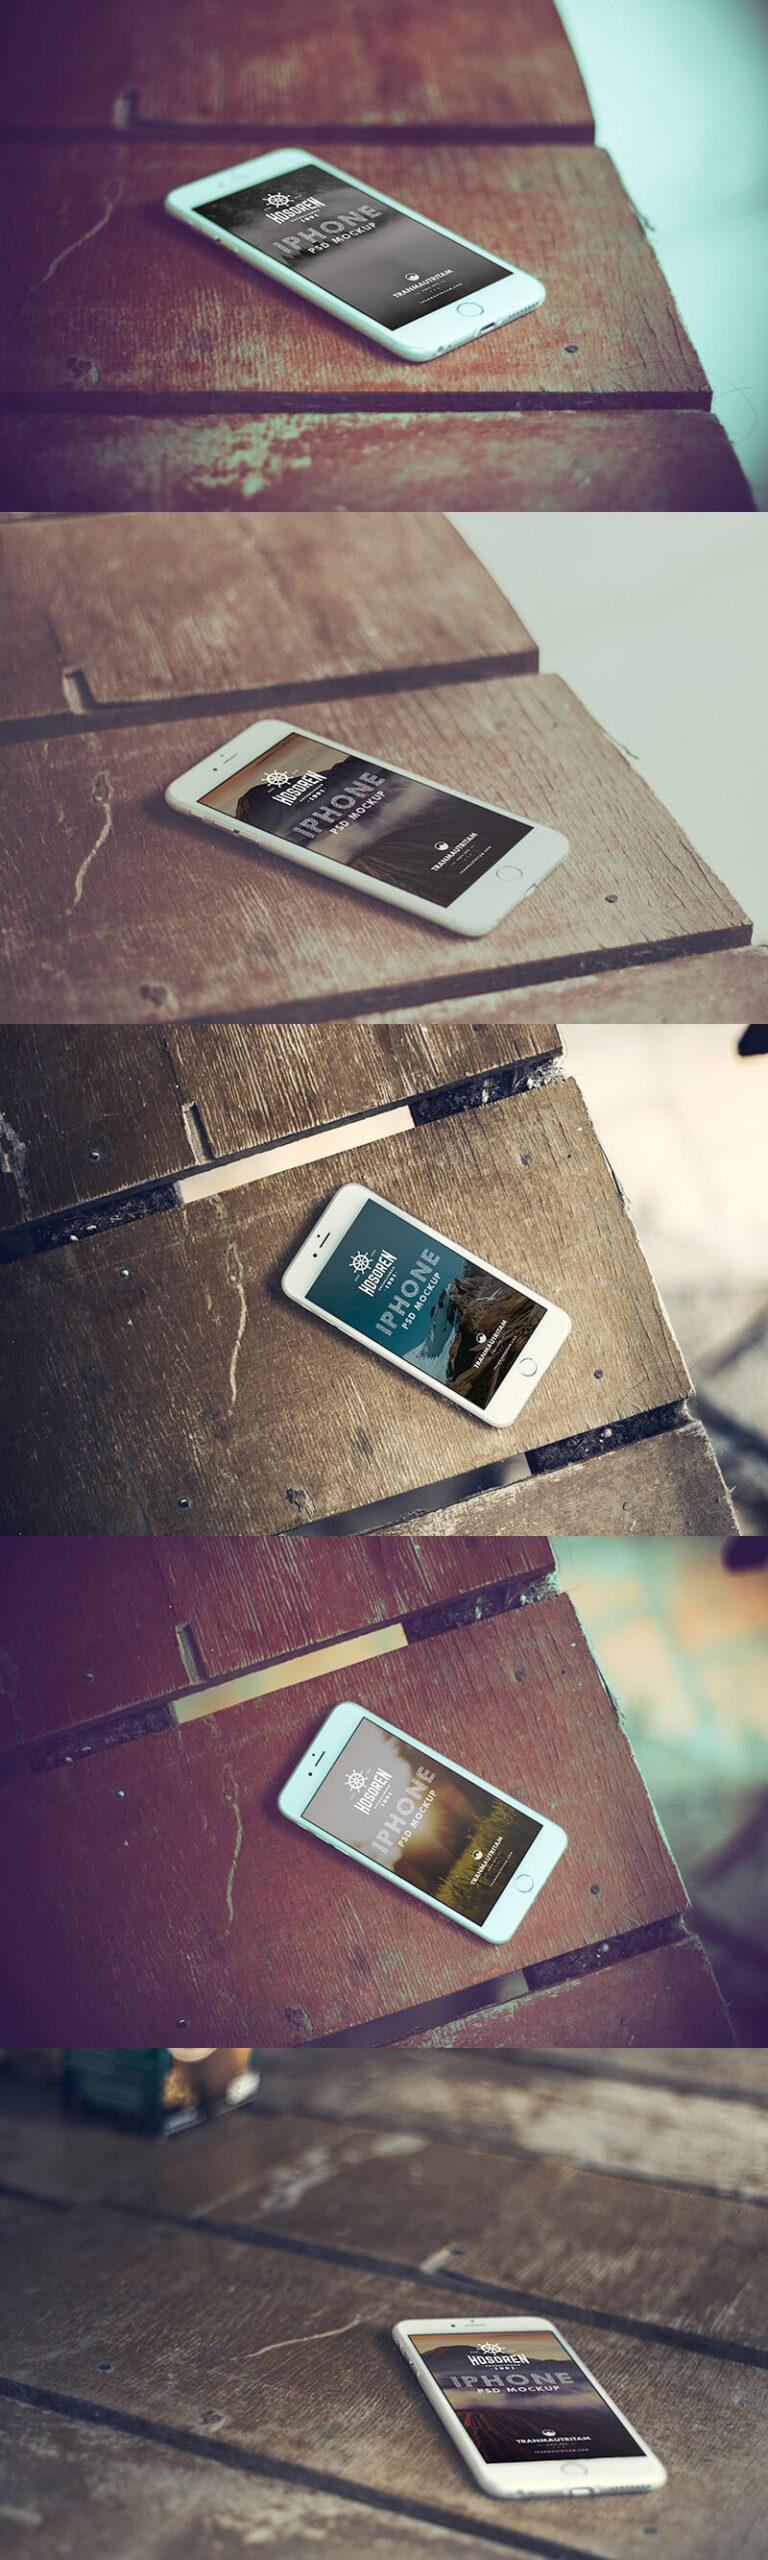 Free 10 iPhone 6 Mockups PSD Template2